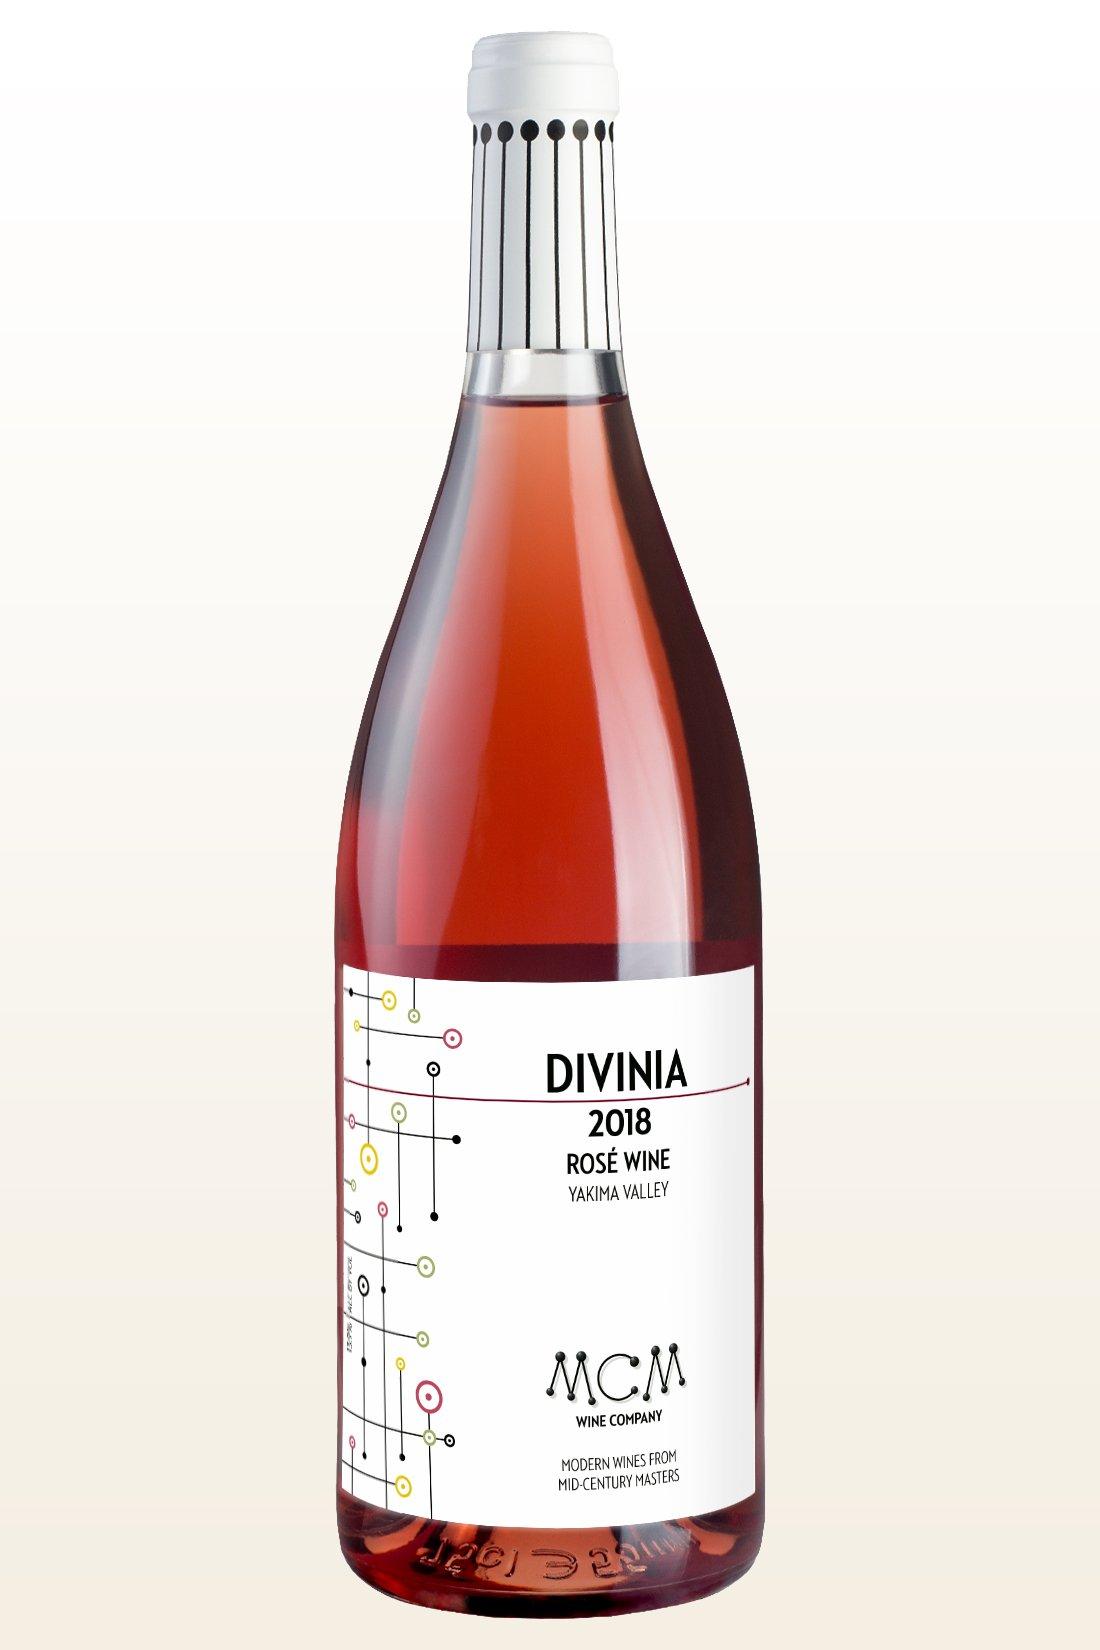 2018 MCM Wine Company Divinia Rosé